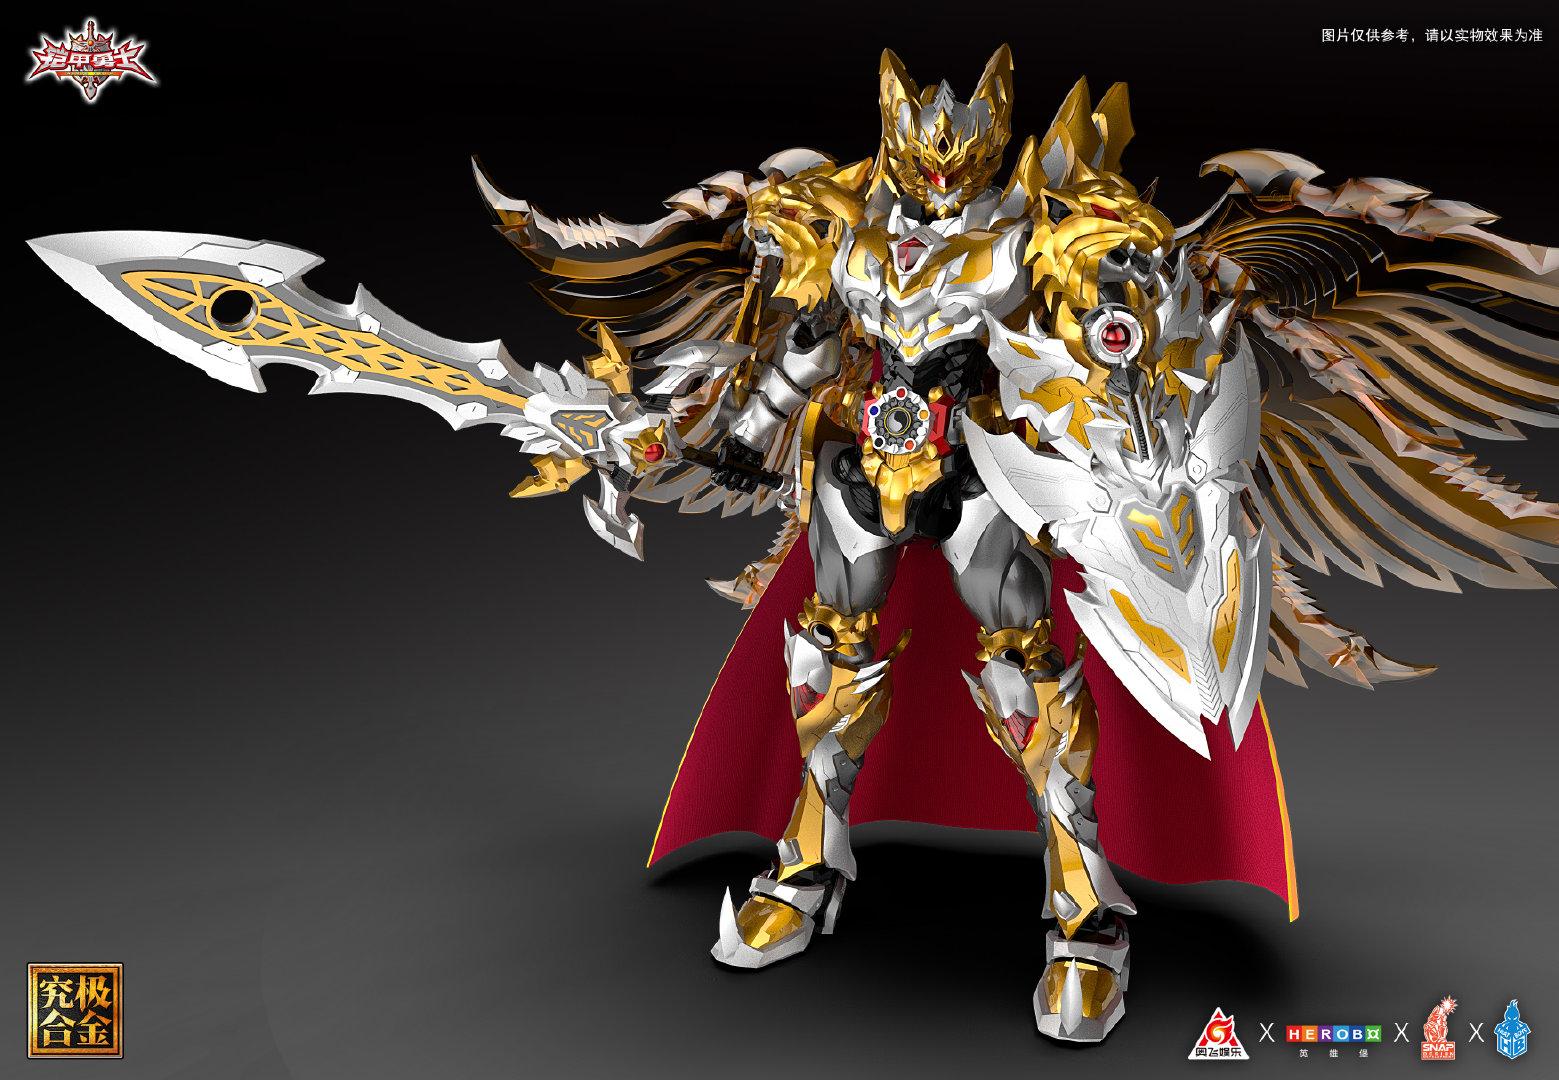 S535_Armor_hero_Emperor_026.jpg